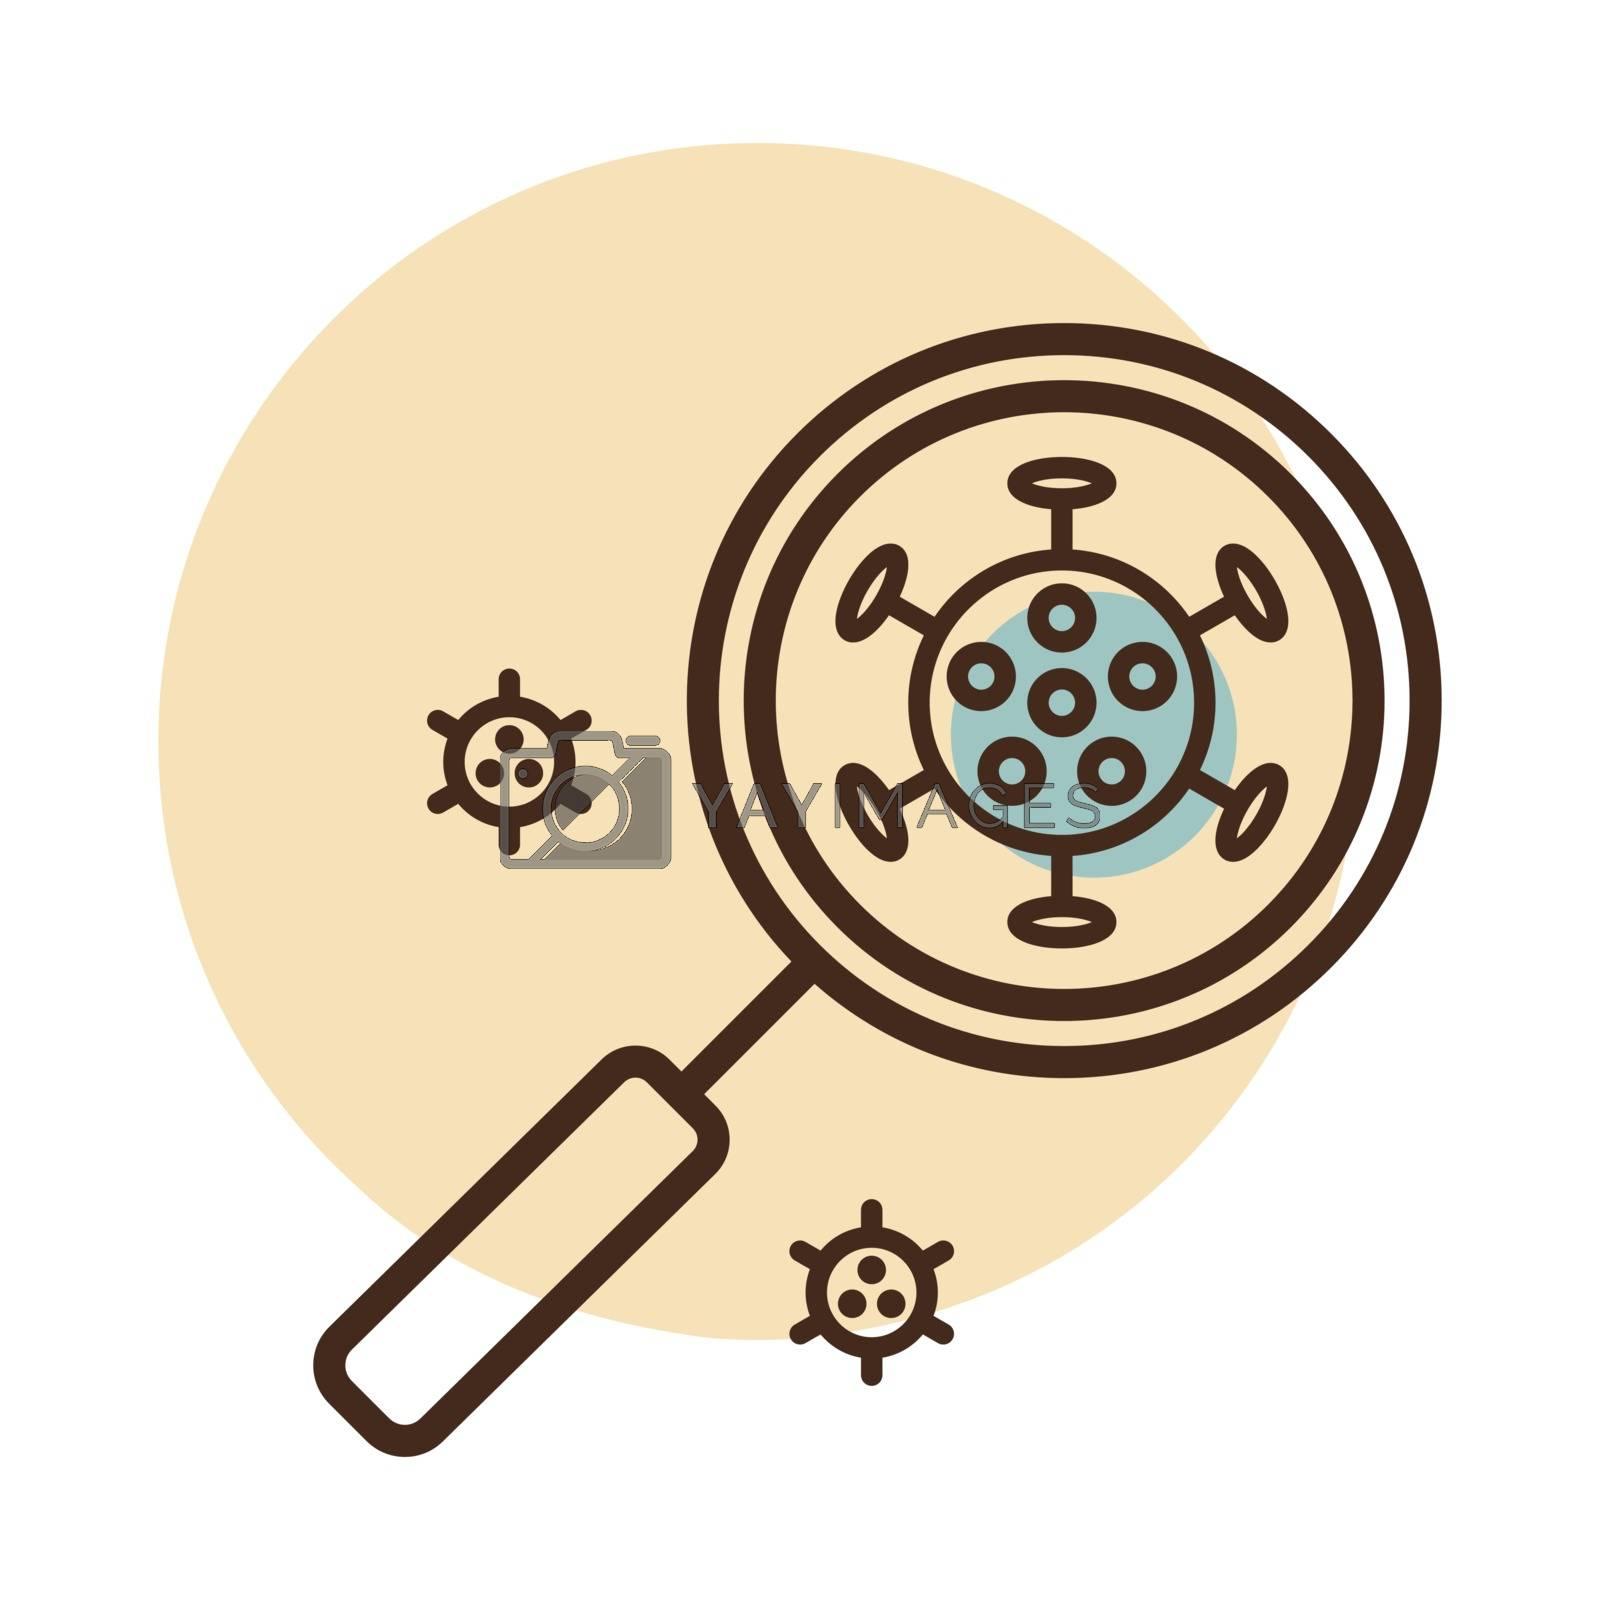 Coronavirus under magnifying glass vector icon. Novel coronavirus. Graph symbol for medical web site and apps design, logo, app, UI